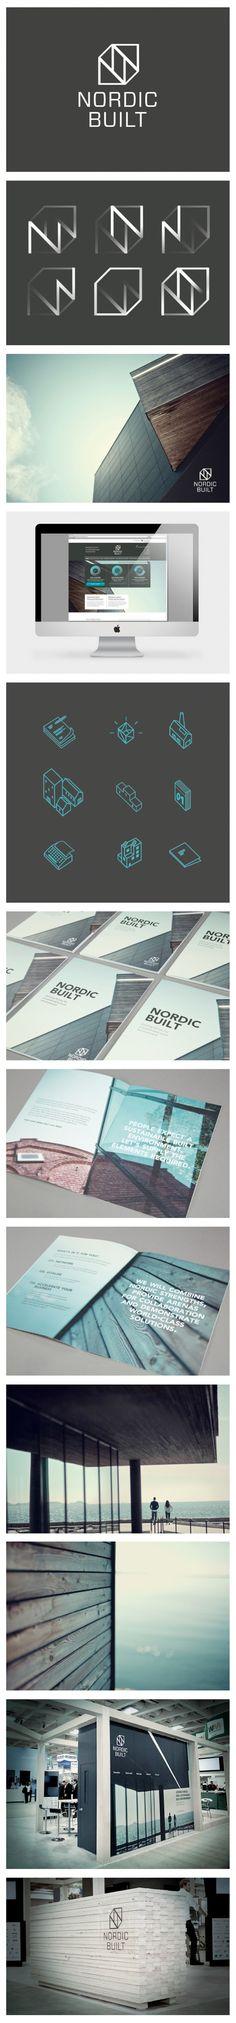 Nordic Built Geometric Line Movement